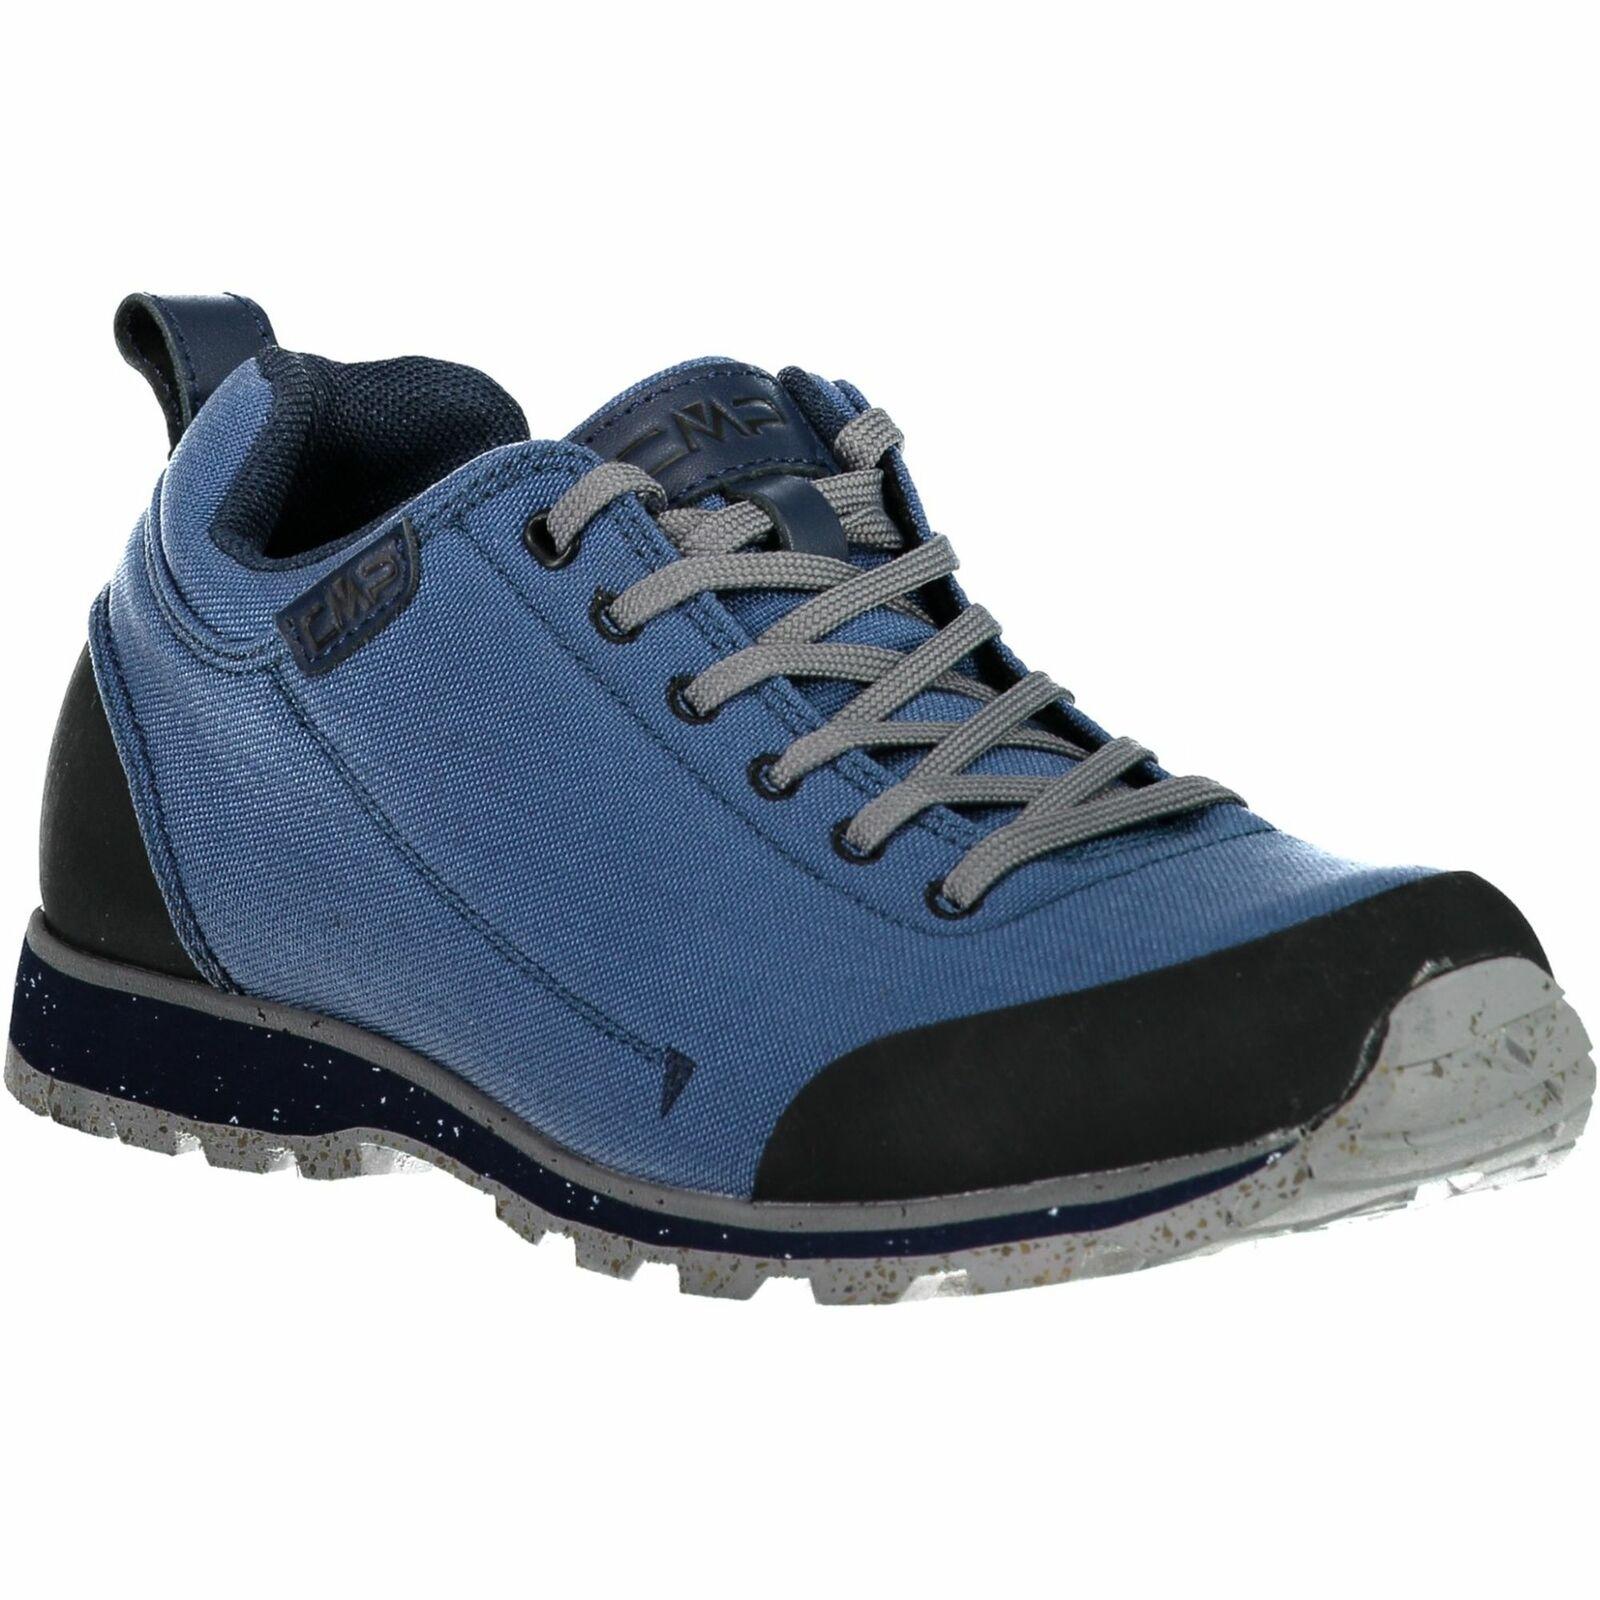 CMP des Rangers outdoorschuh Elettra Low Cordura hiking schuhe Blau uniFarbee